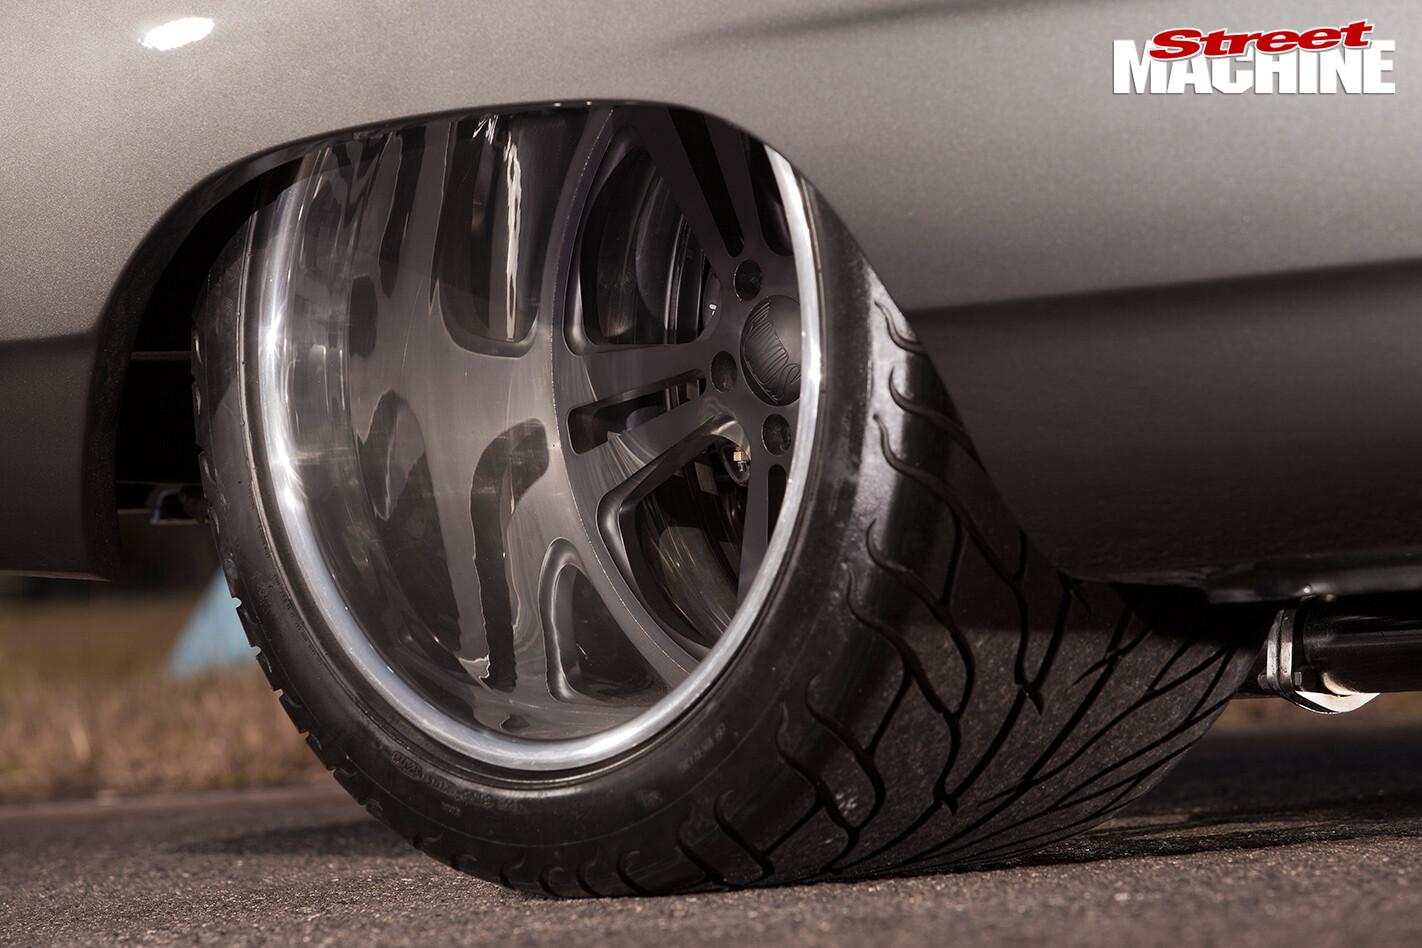 500-CUBE-1970-PLYMOUTH-SATELLITE-wheels